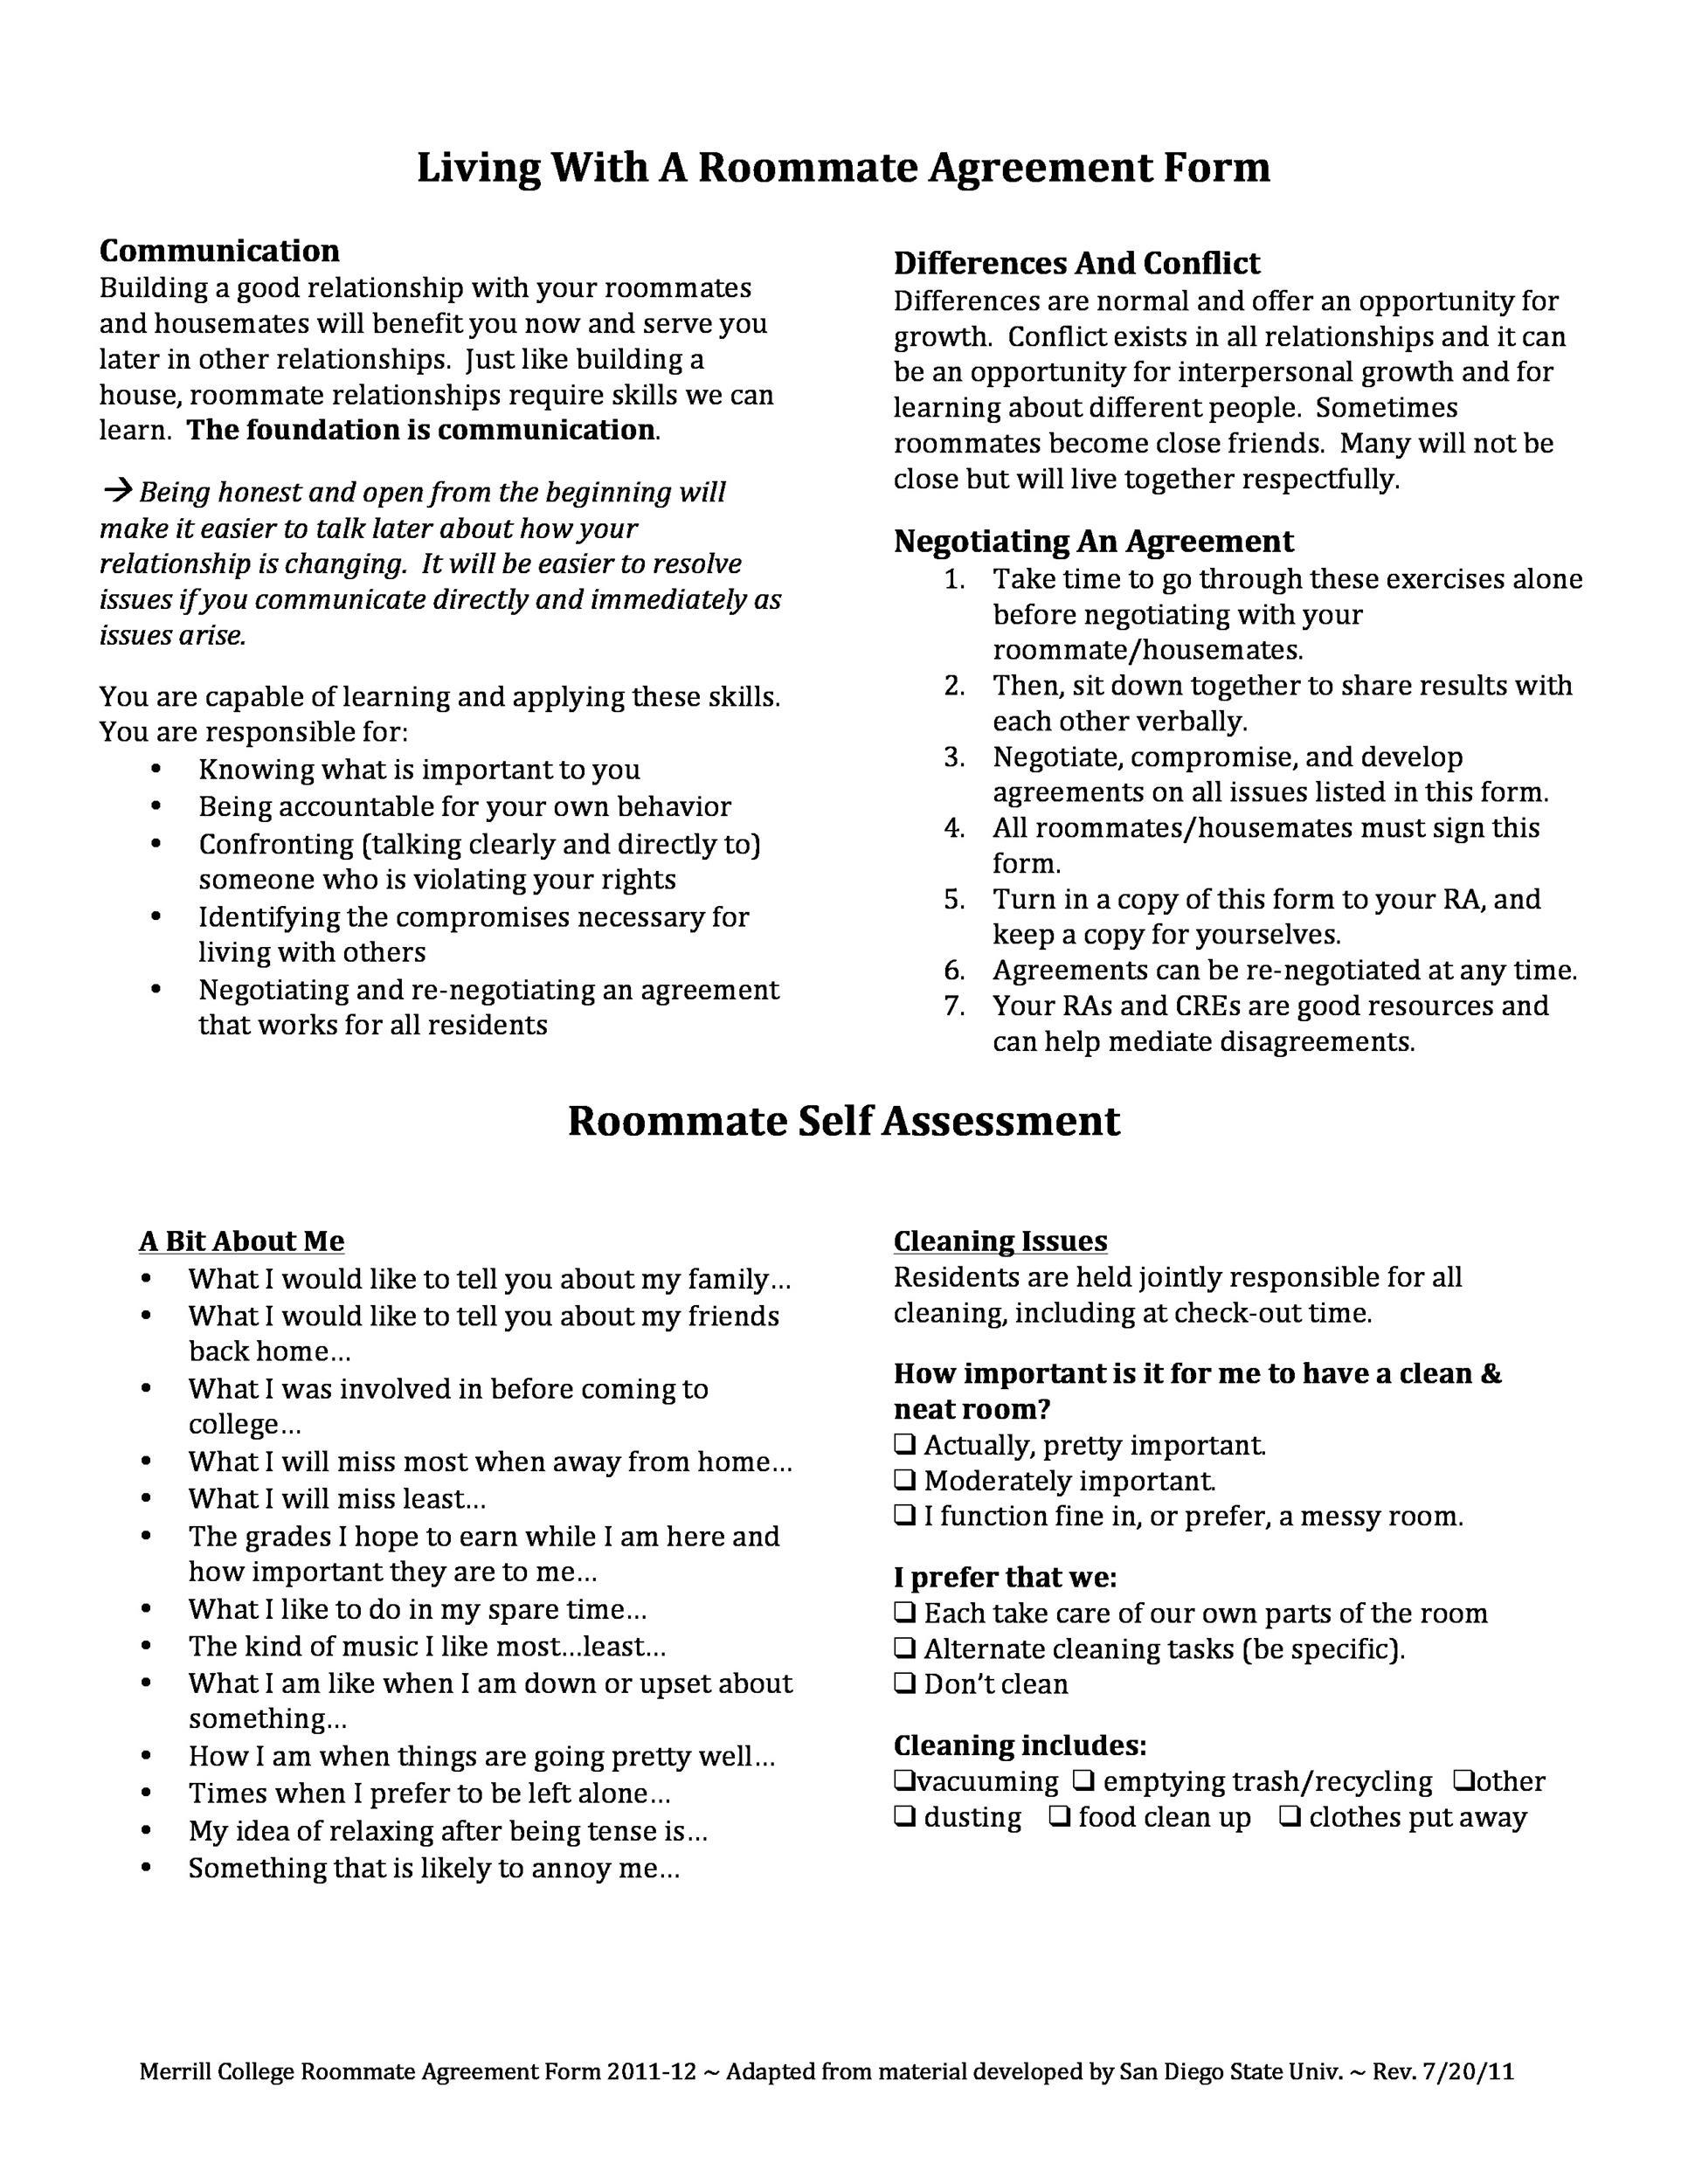 Rental Agreement Template For Roommates Cv Resumes Maker Guide